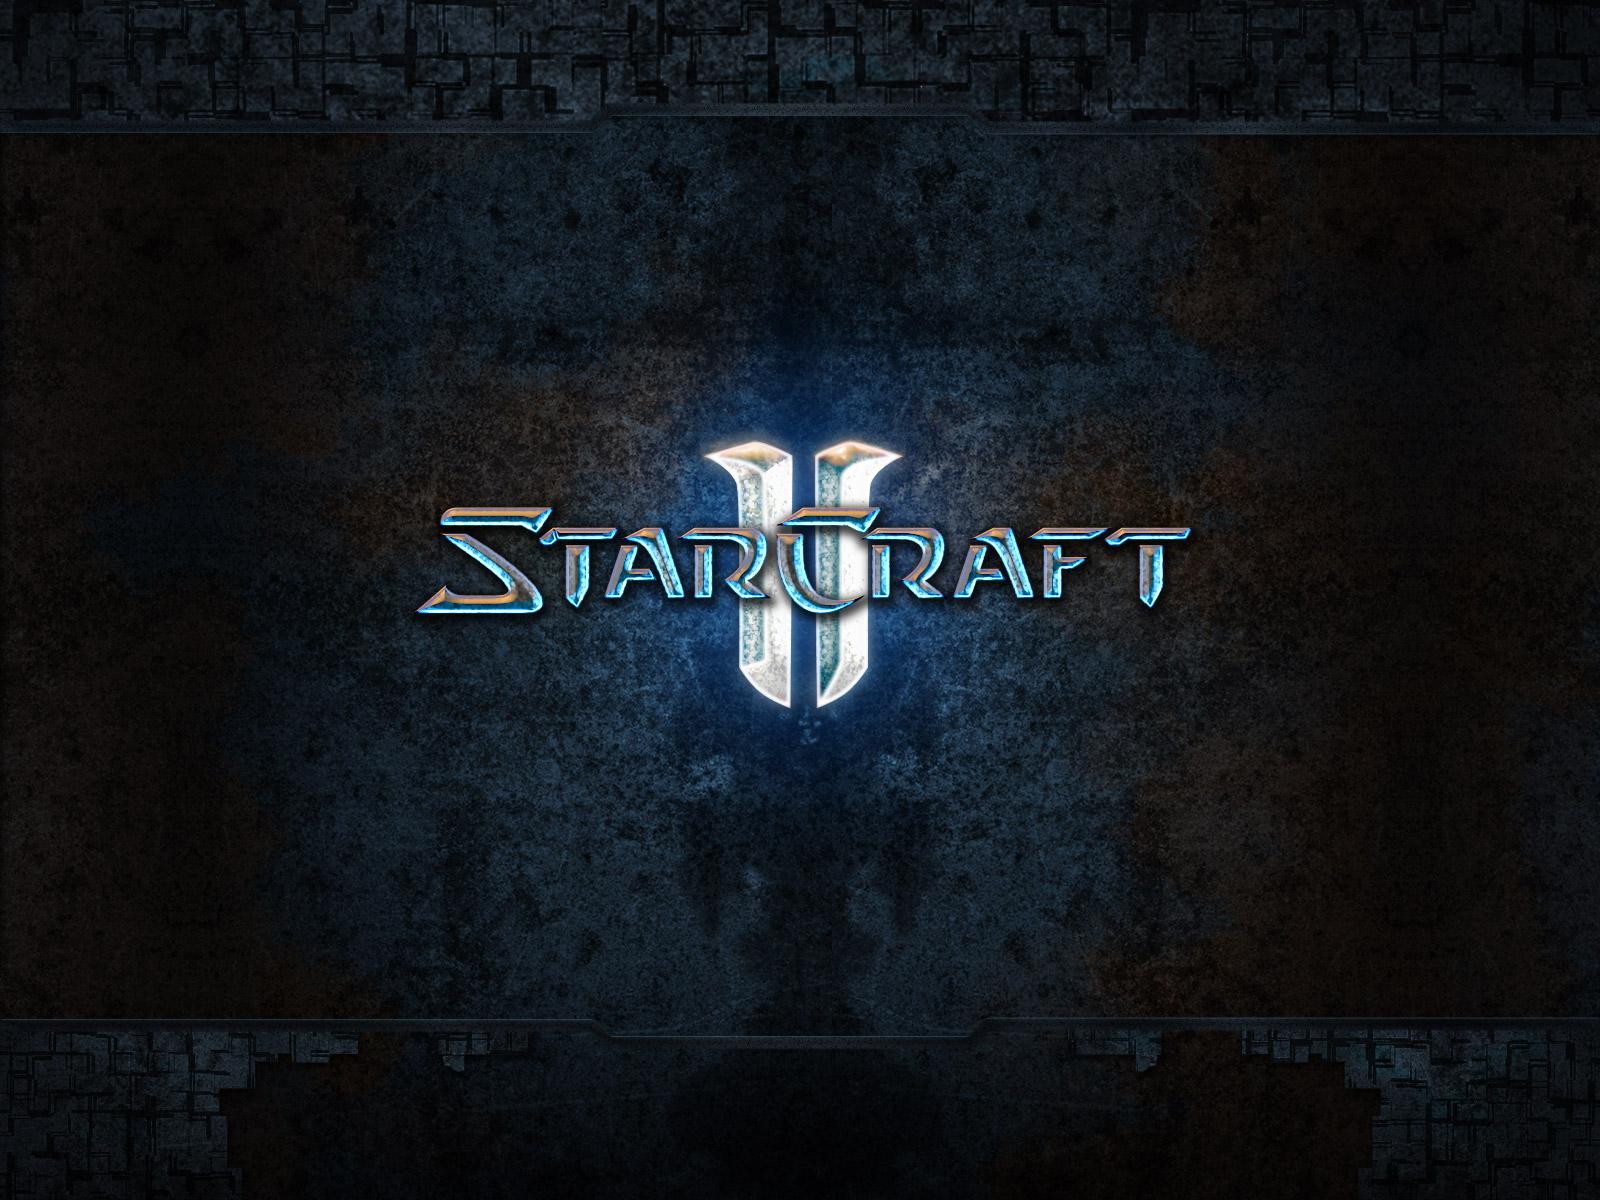 Starcraft 2 wallpaper design Tutzor 1600x1200